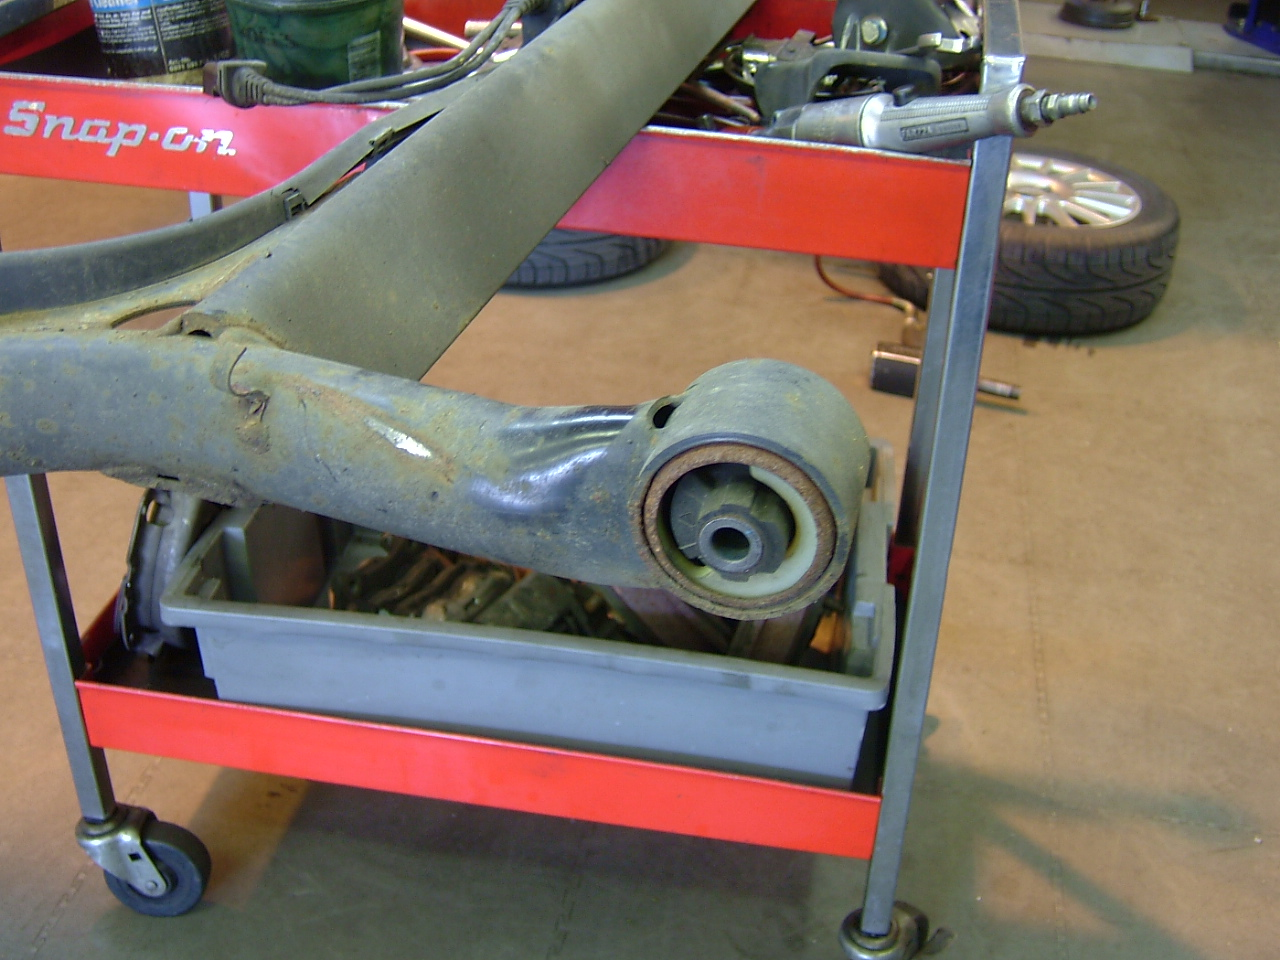 rear beam oem bushing removal and refit pumapeople Destroyer Flecher Haynes Manual 08 Nissan Maxima Haynes Manual